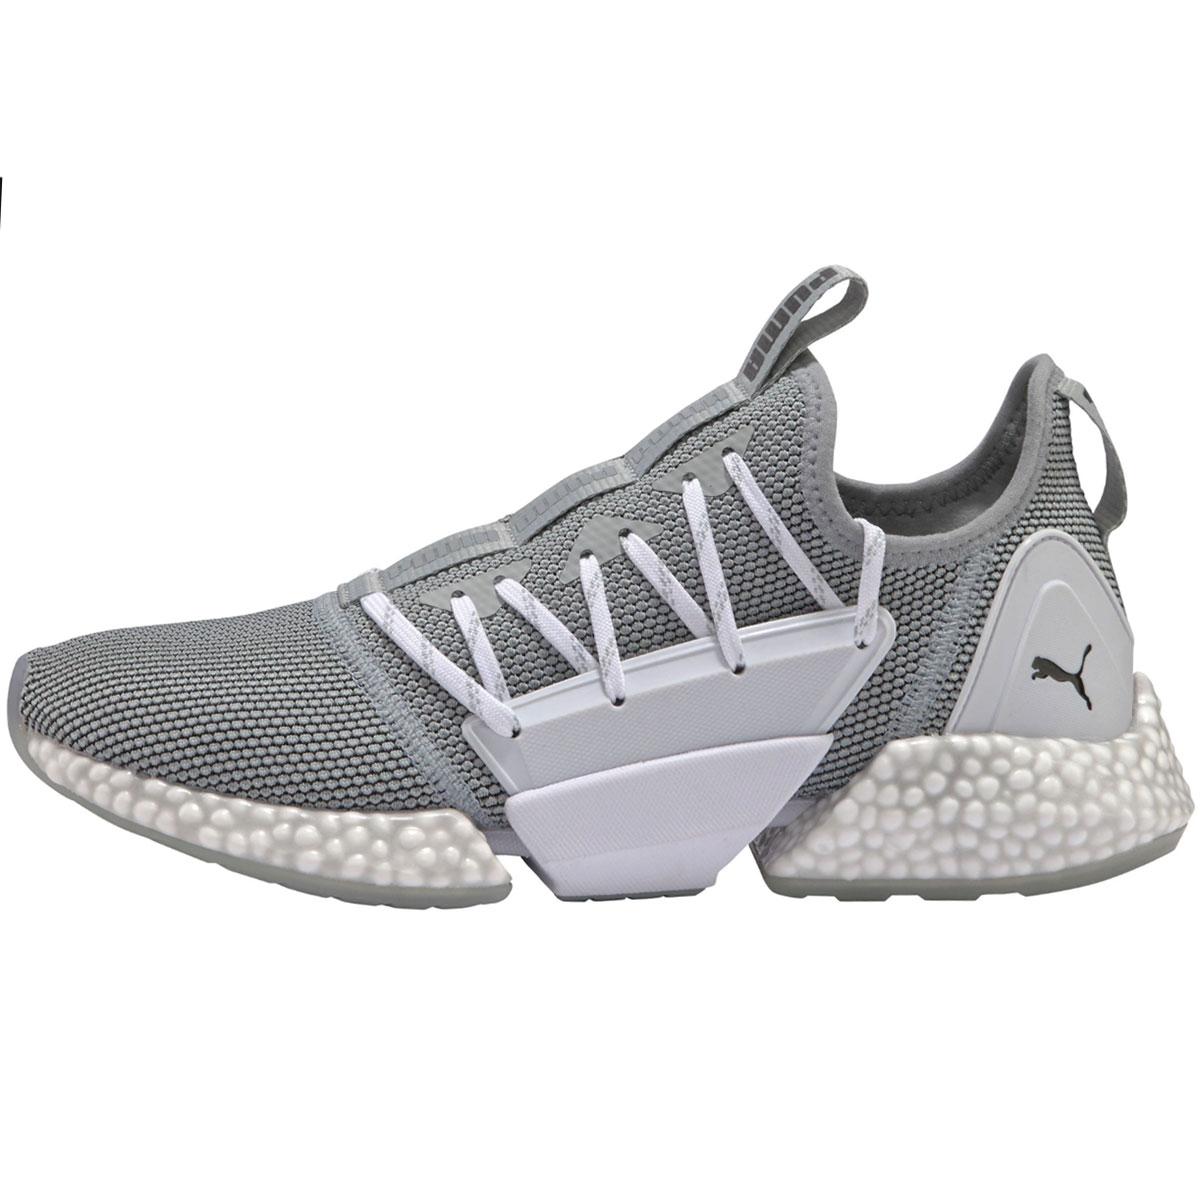 Puma Hybrid Rocket Runner Herren Sneaker grau weiß 191592 07